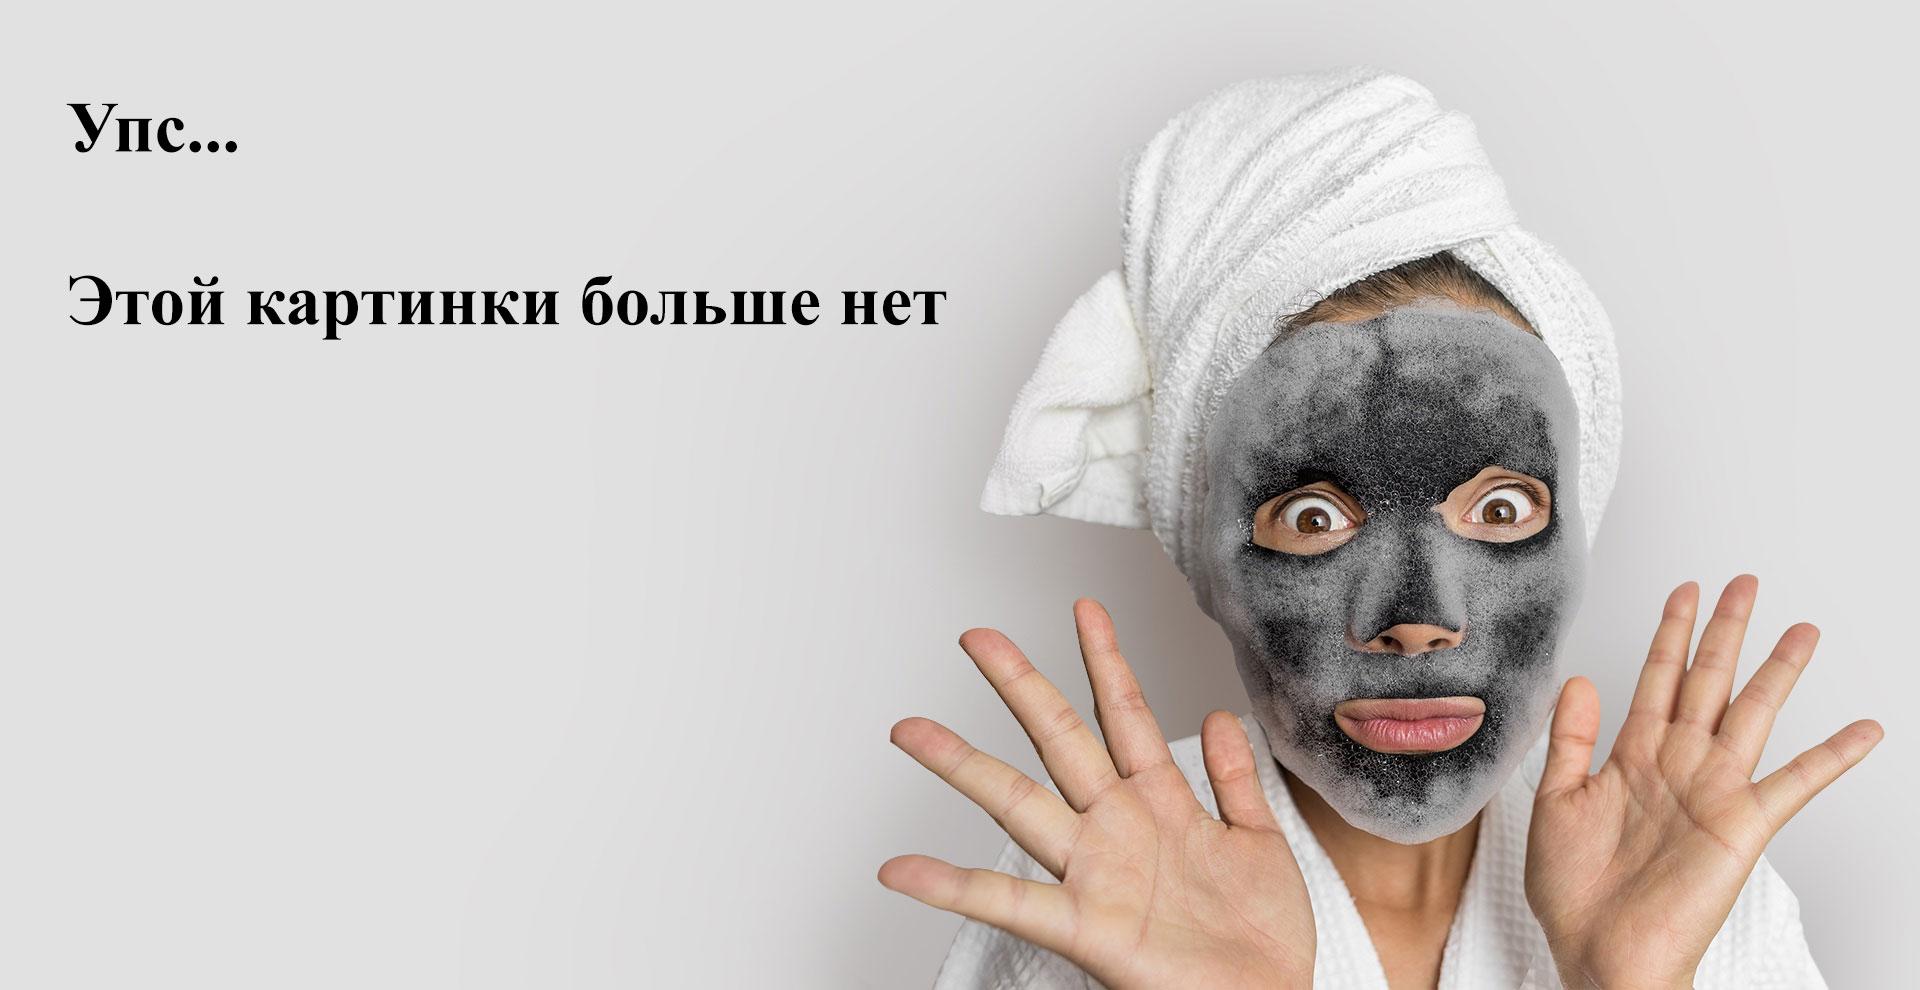 Provoc, Gel Eye Liner 86 Desired, Цвет Шоколадный